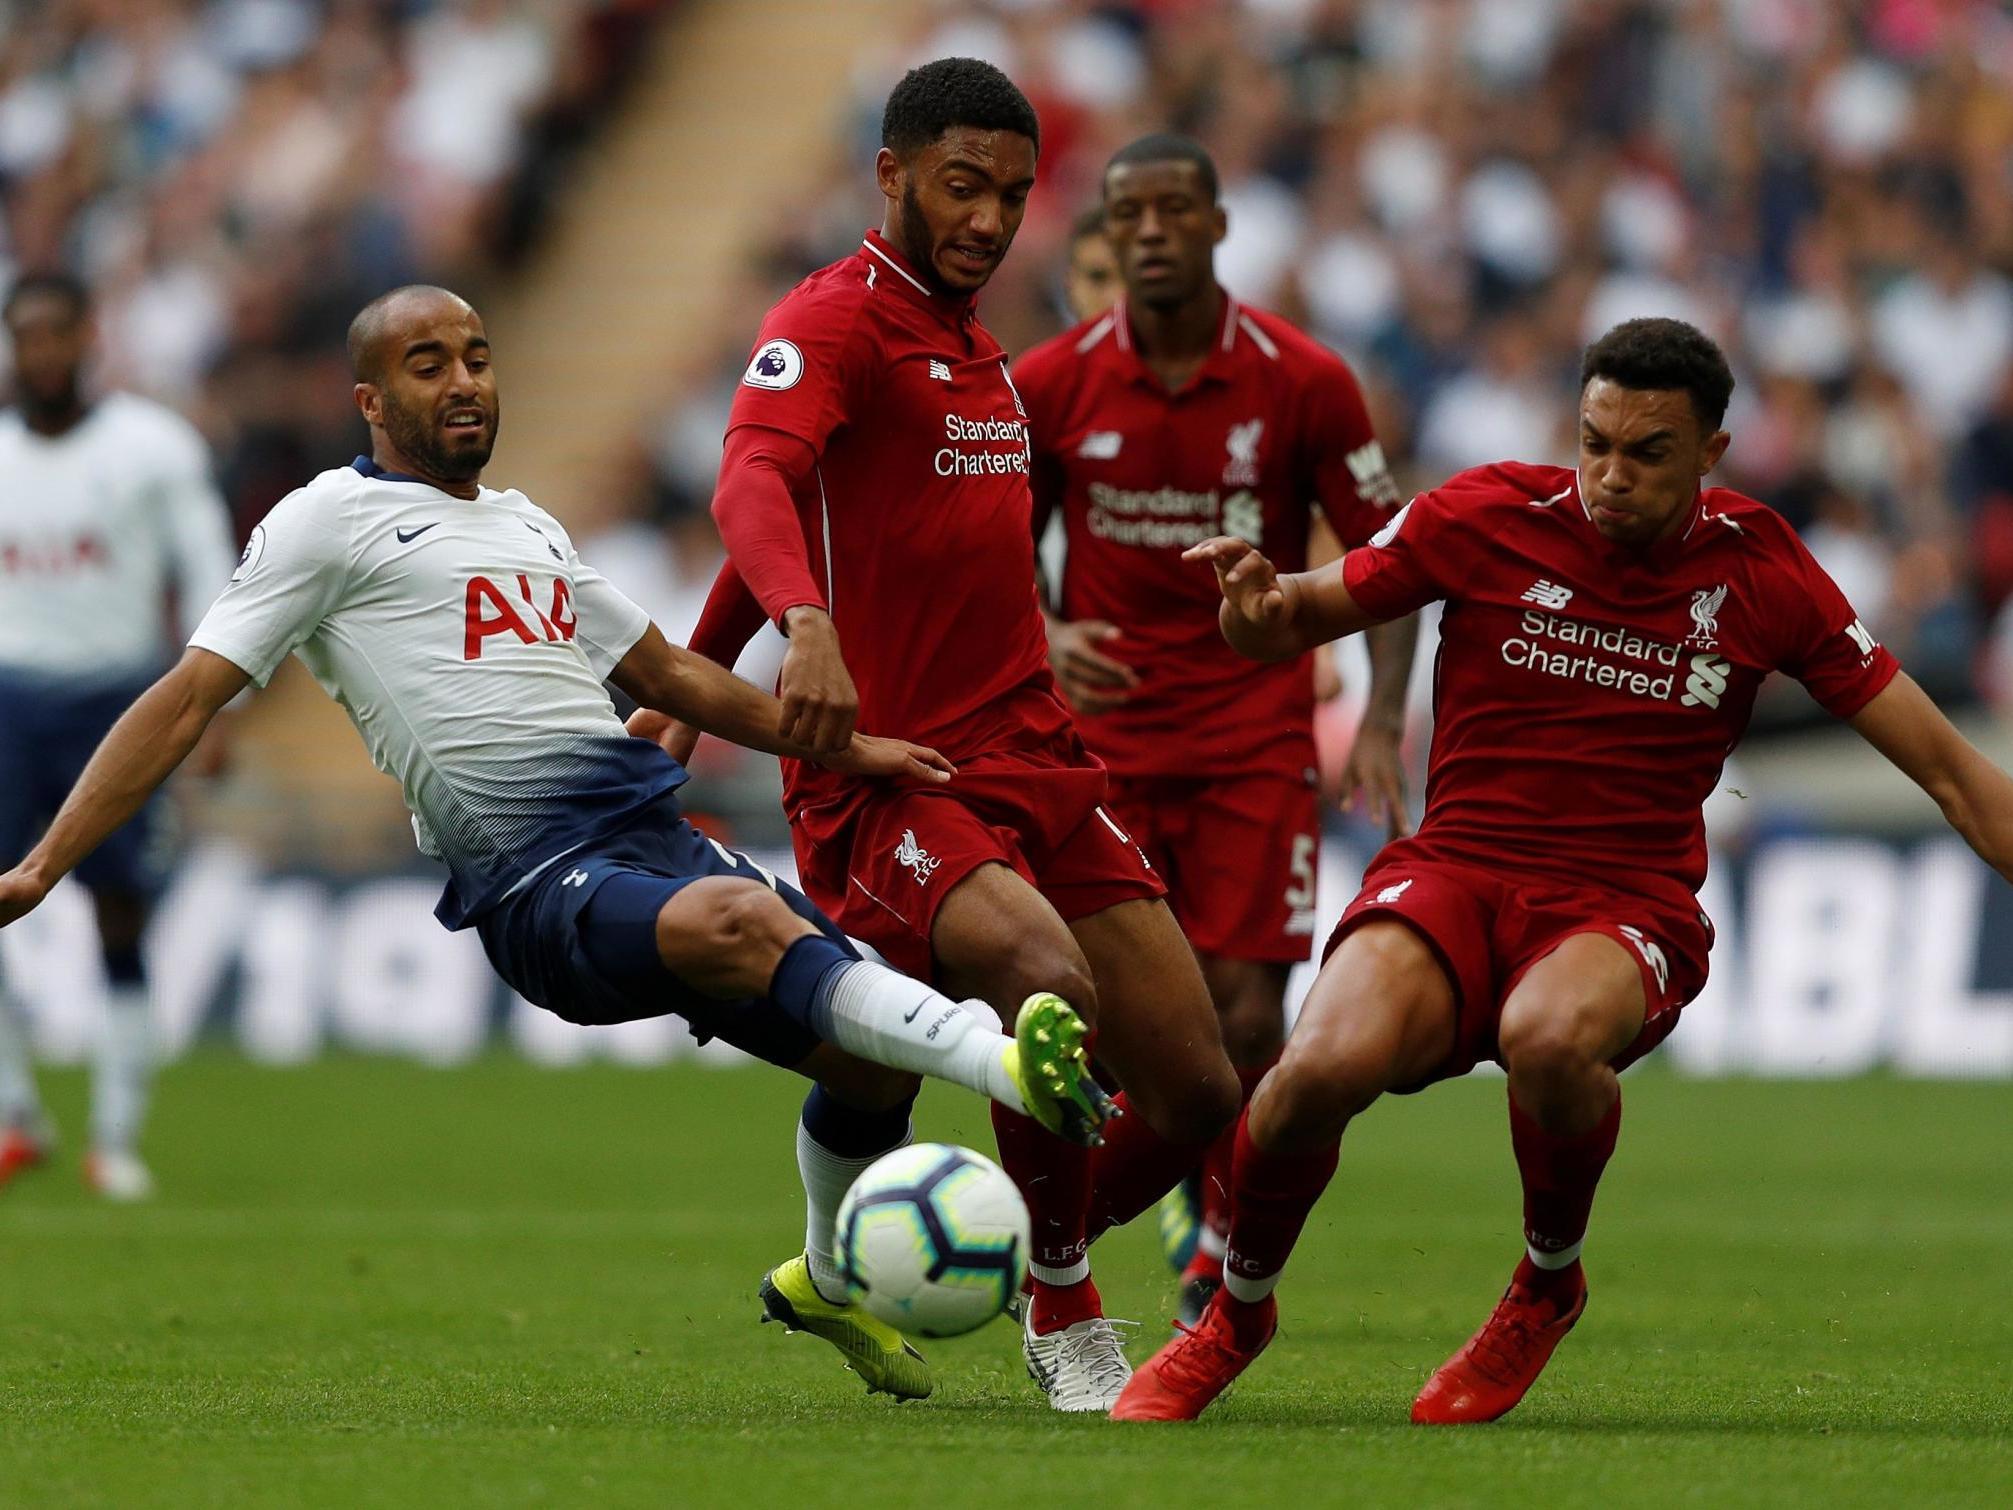 Liverpool vs Tottenham prediction, plus team news, possible